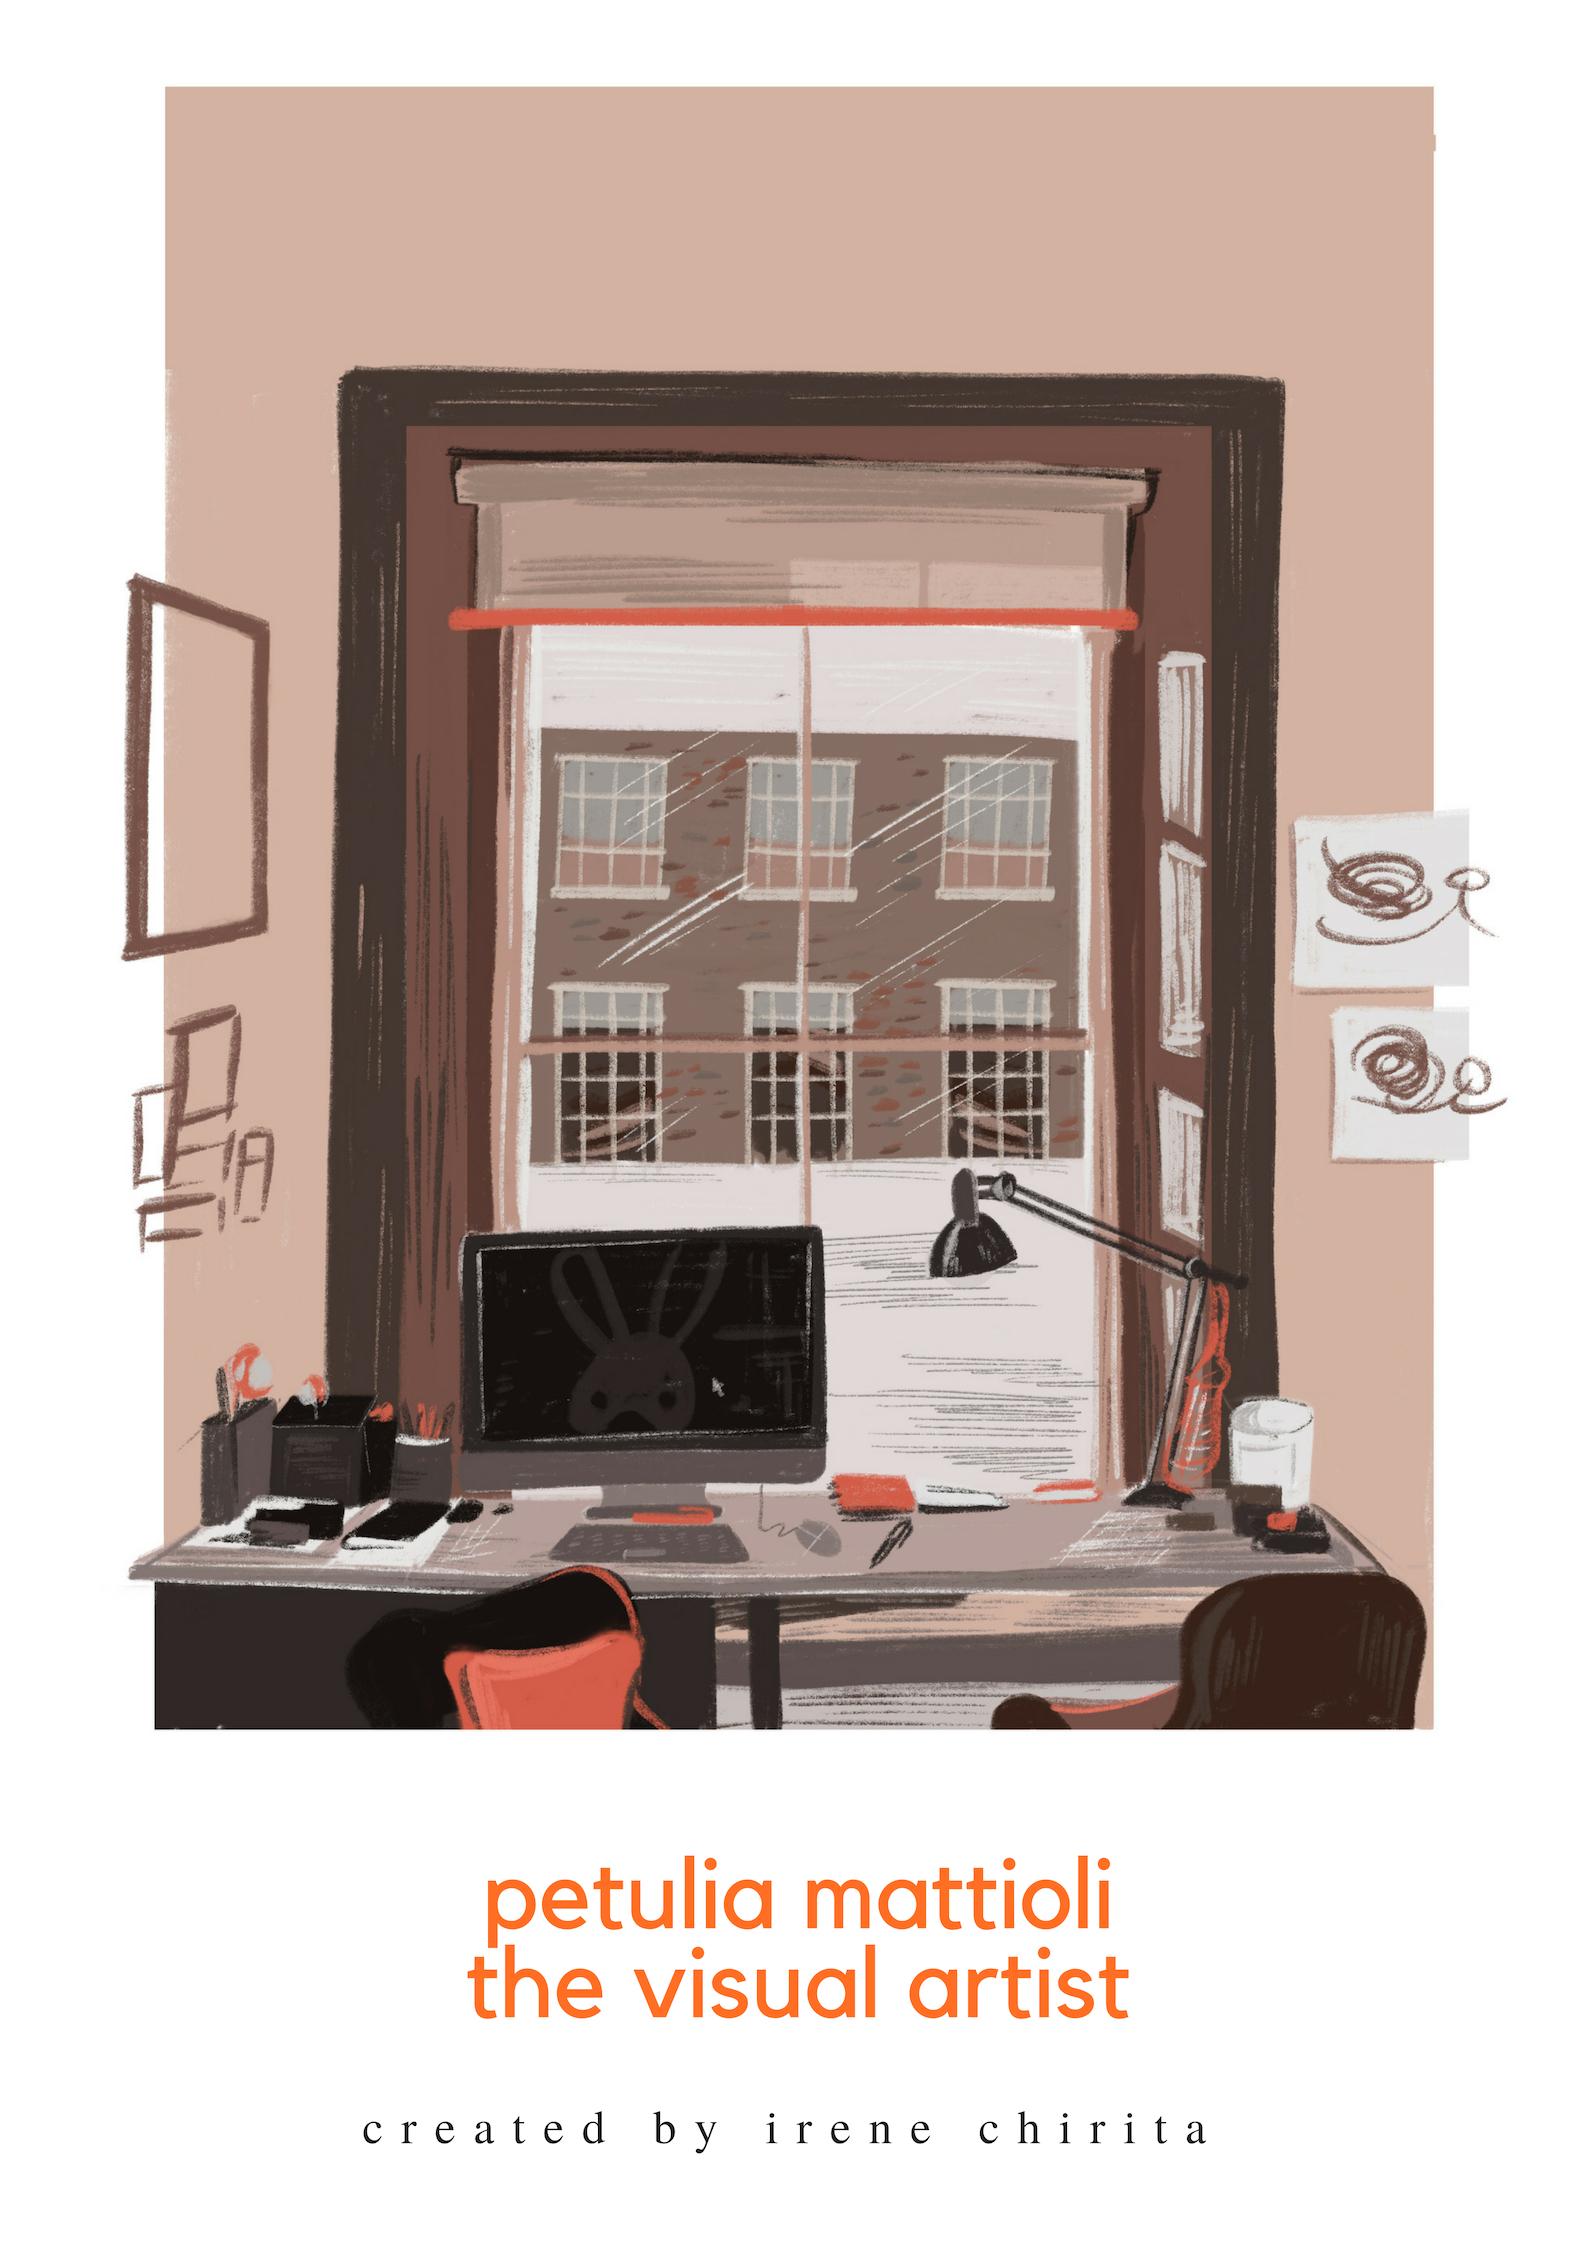 Petulia's desk in her home [Diandra Elmira]